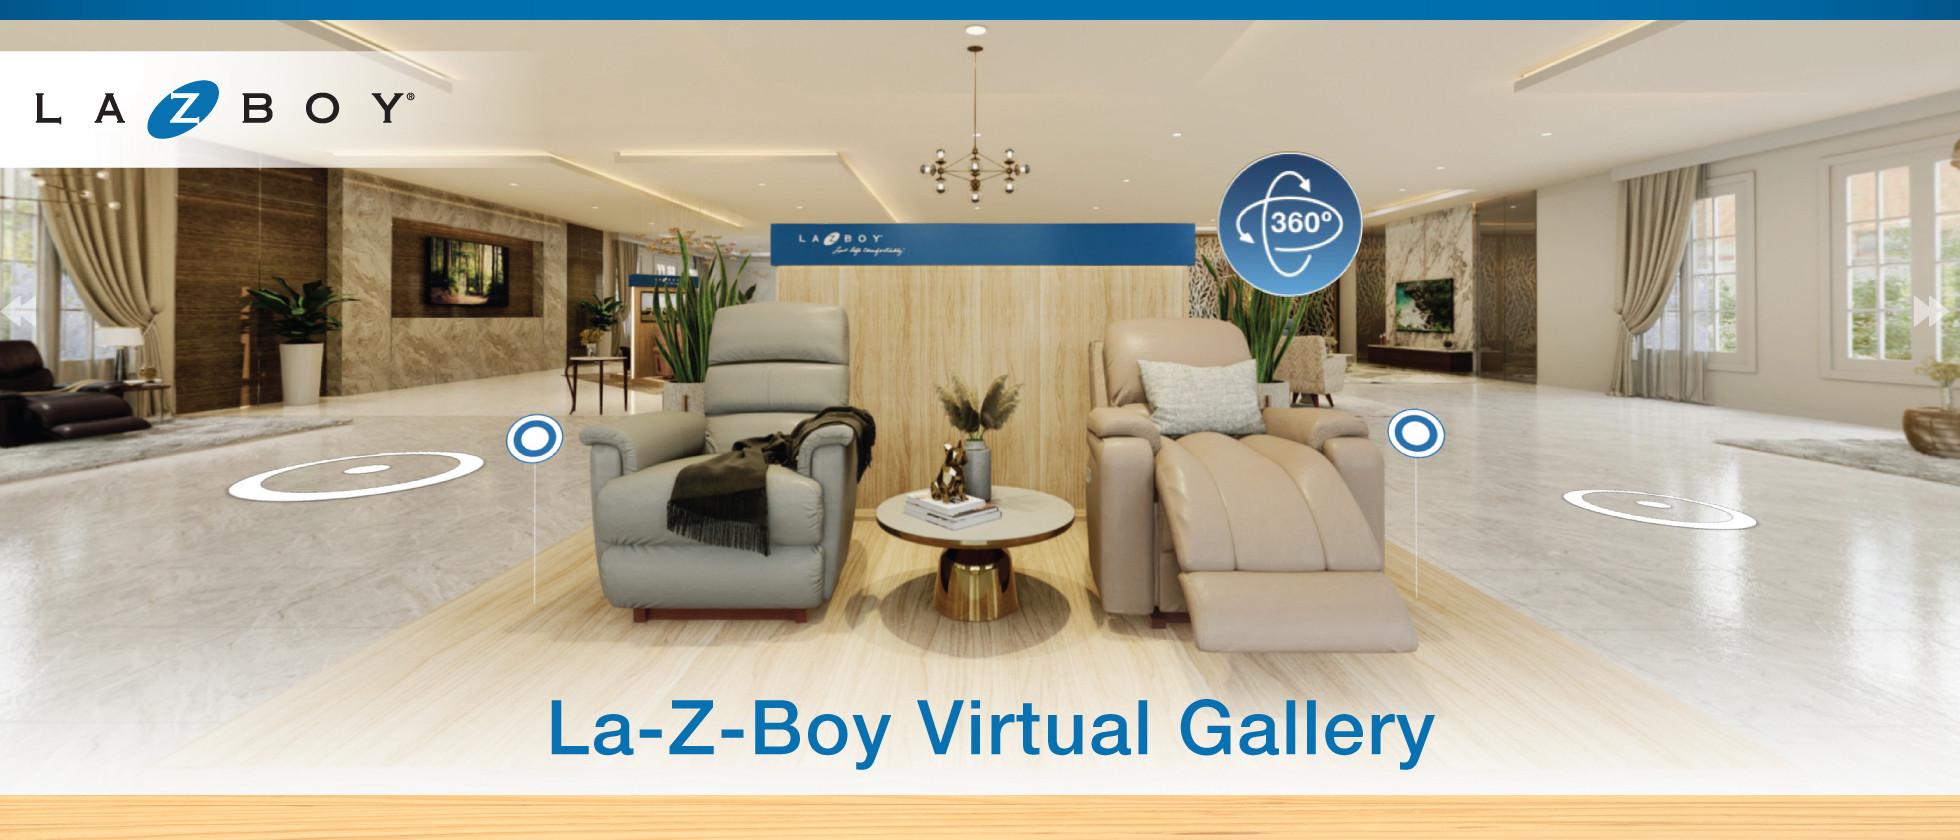 La-Z-Boy Virtual Gallery